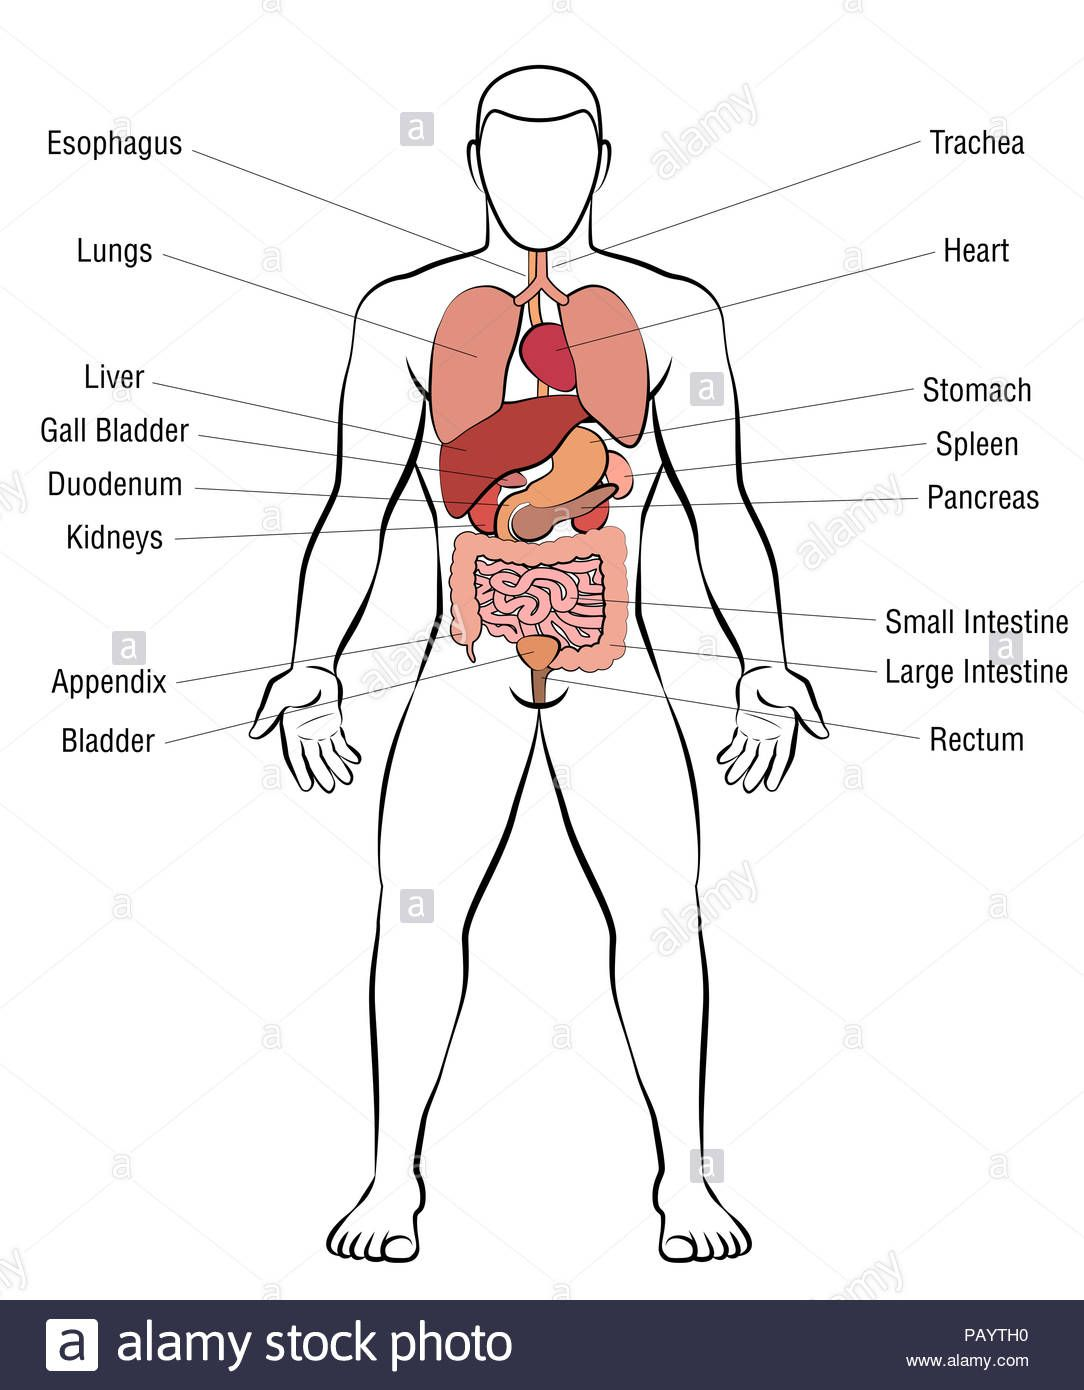 hight resolution of picture internal organs internal organs male body schematic human anatomy illustration